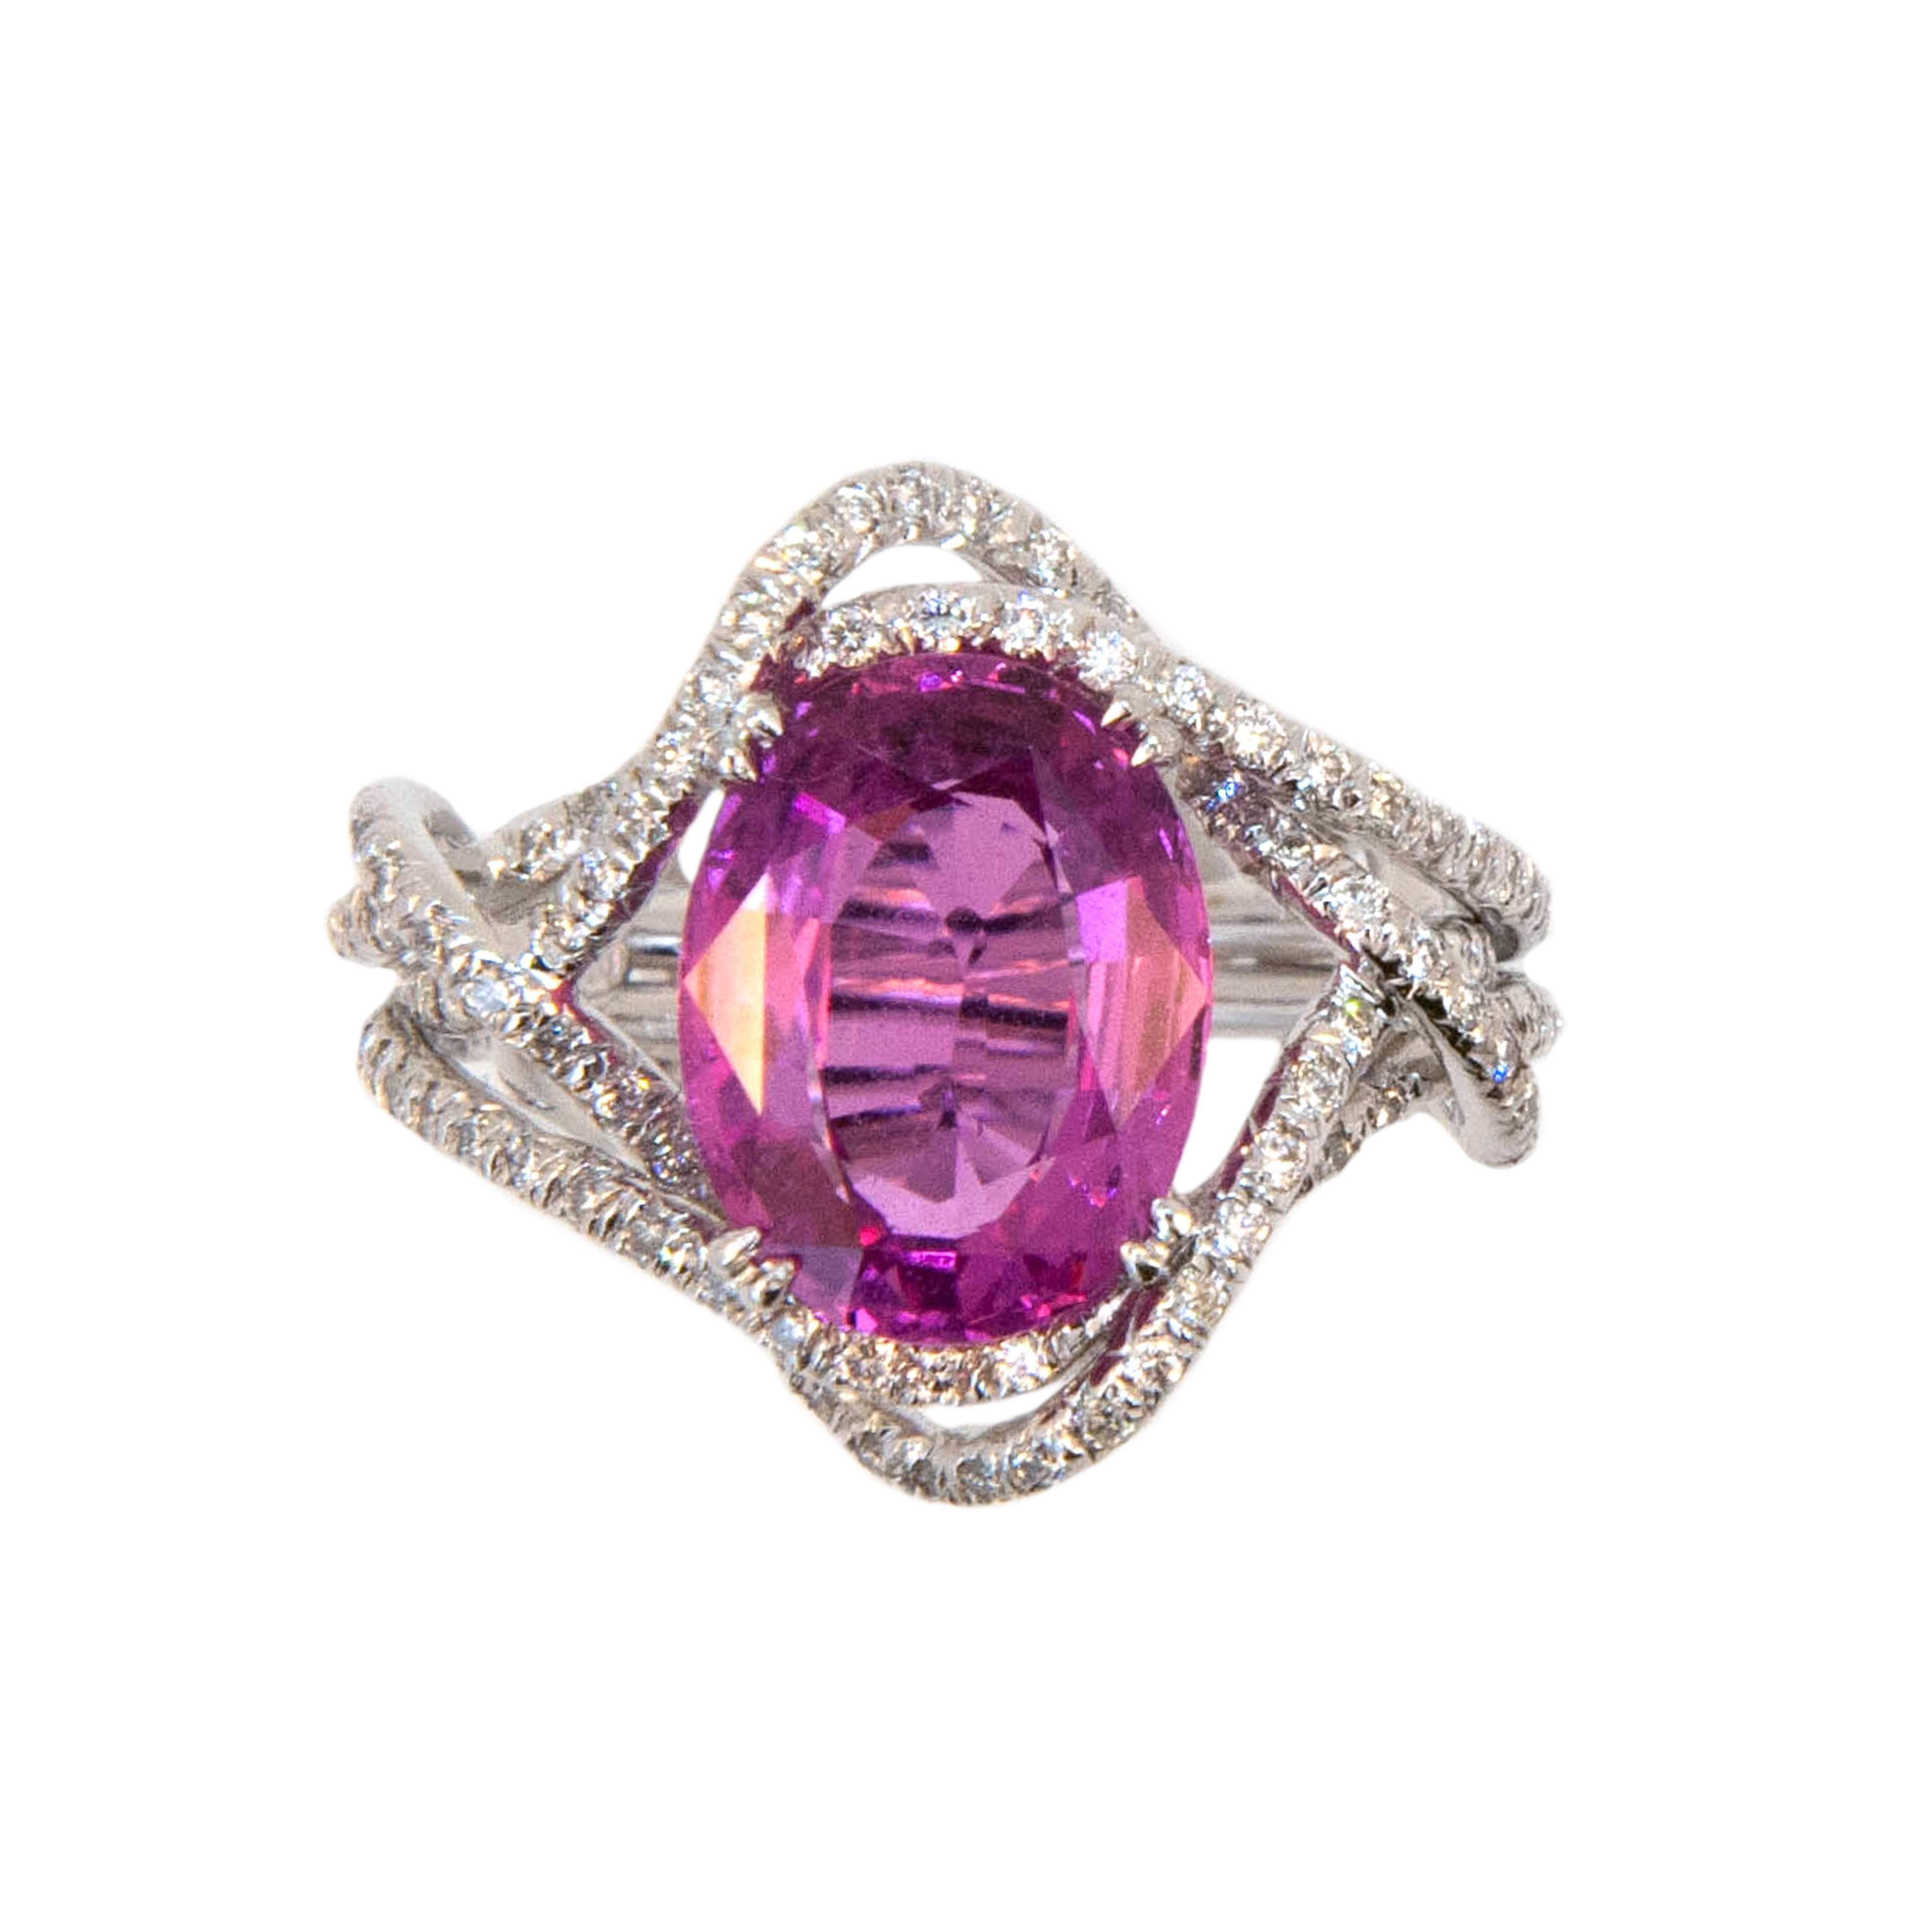 Laura Munder 5.28 Carat Oval Pink Sapphire Diamond White Gold Ring